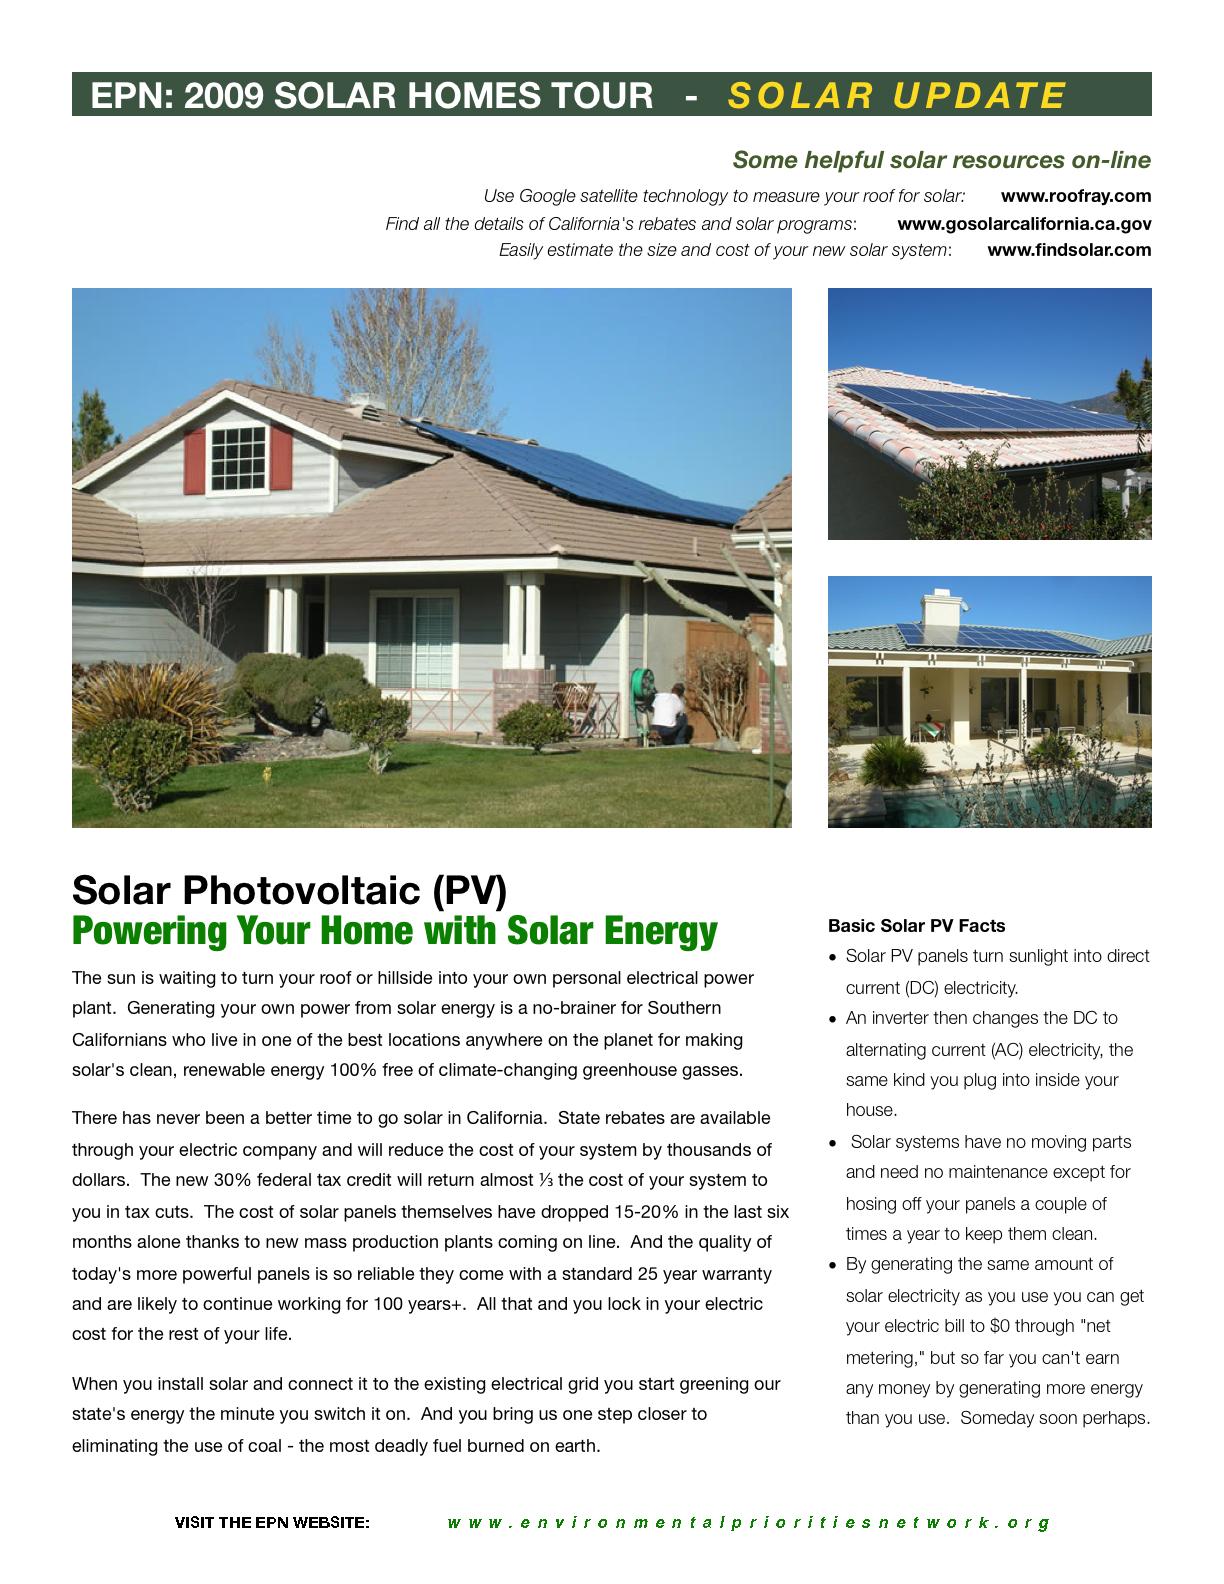 solar-pv-fact-sheet